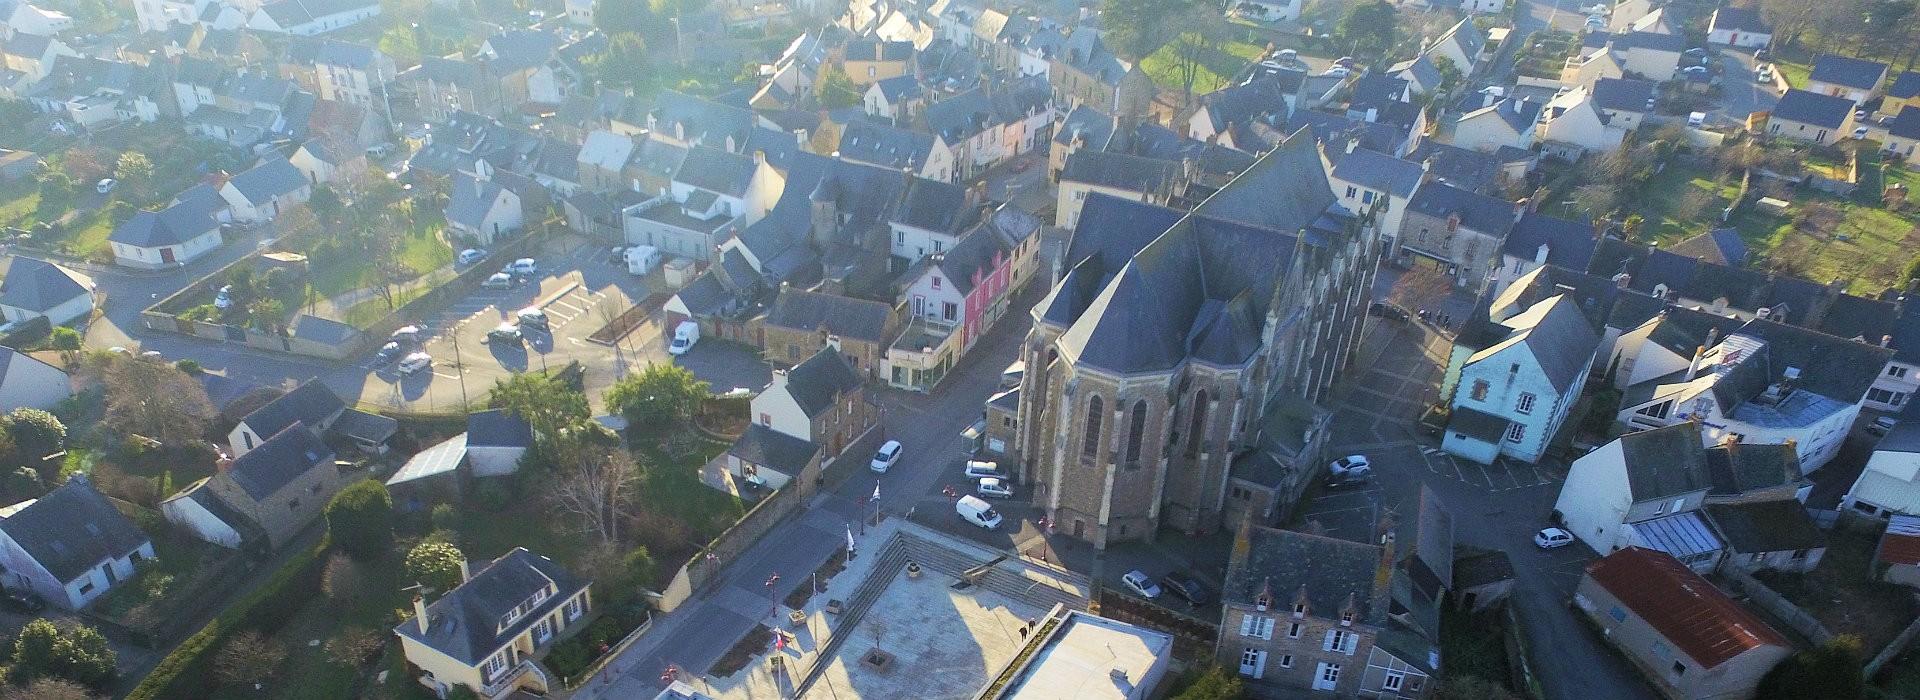 Balade dans le bourg d'Herbignac - Mairie d'Herbignac